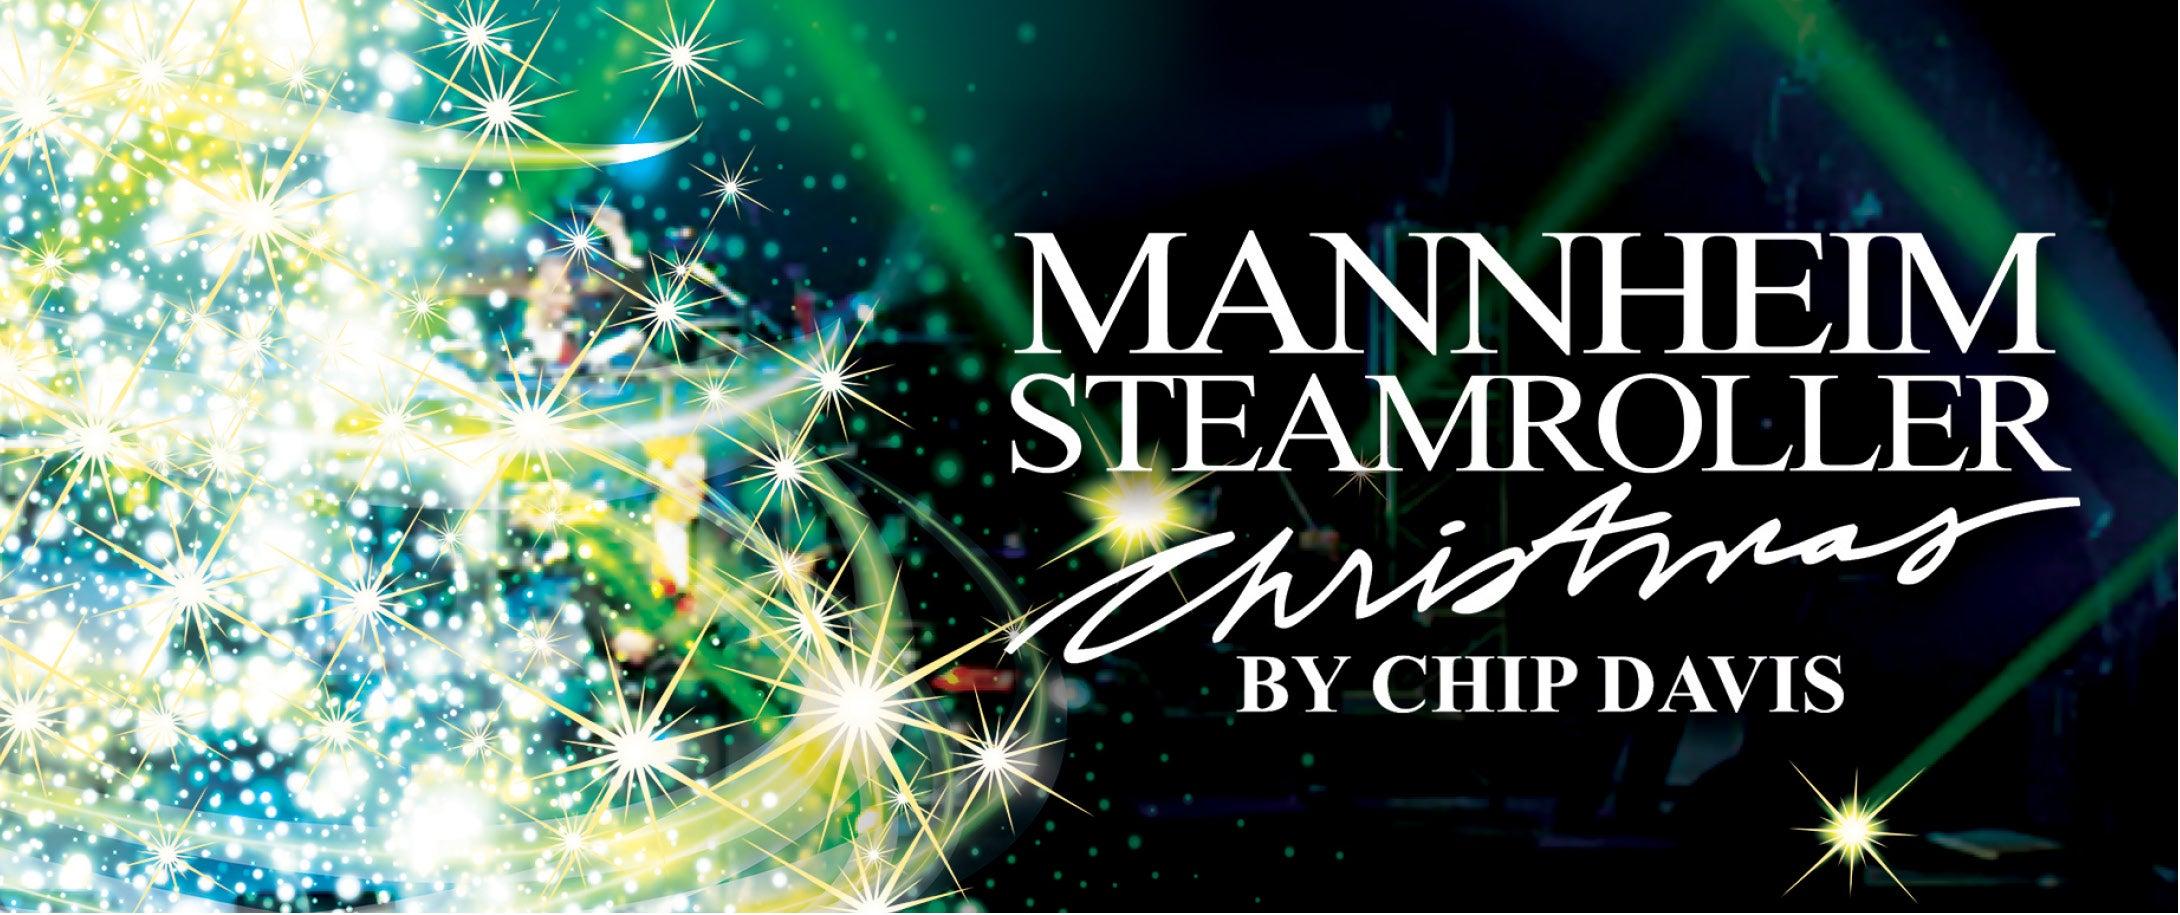 Mannheim Steamroller Christmas By Chip Davis - Broadway in the Basin